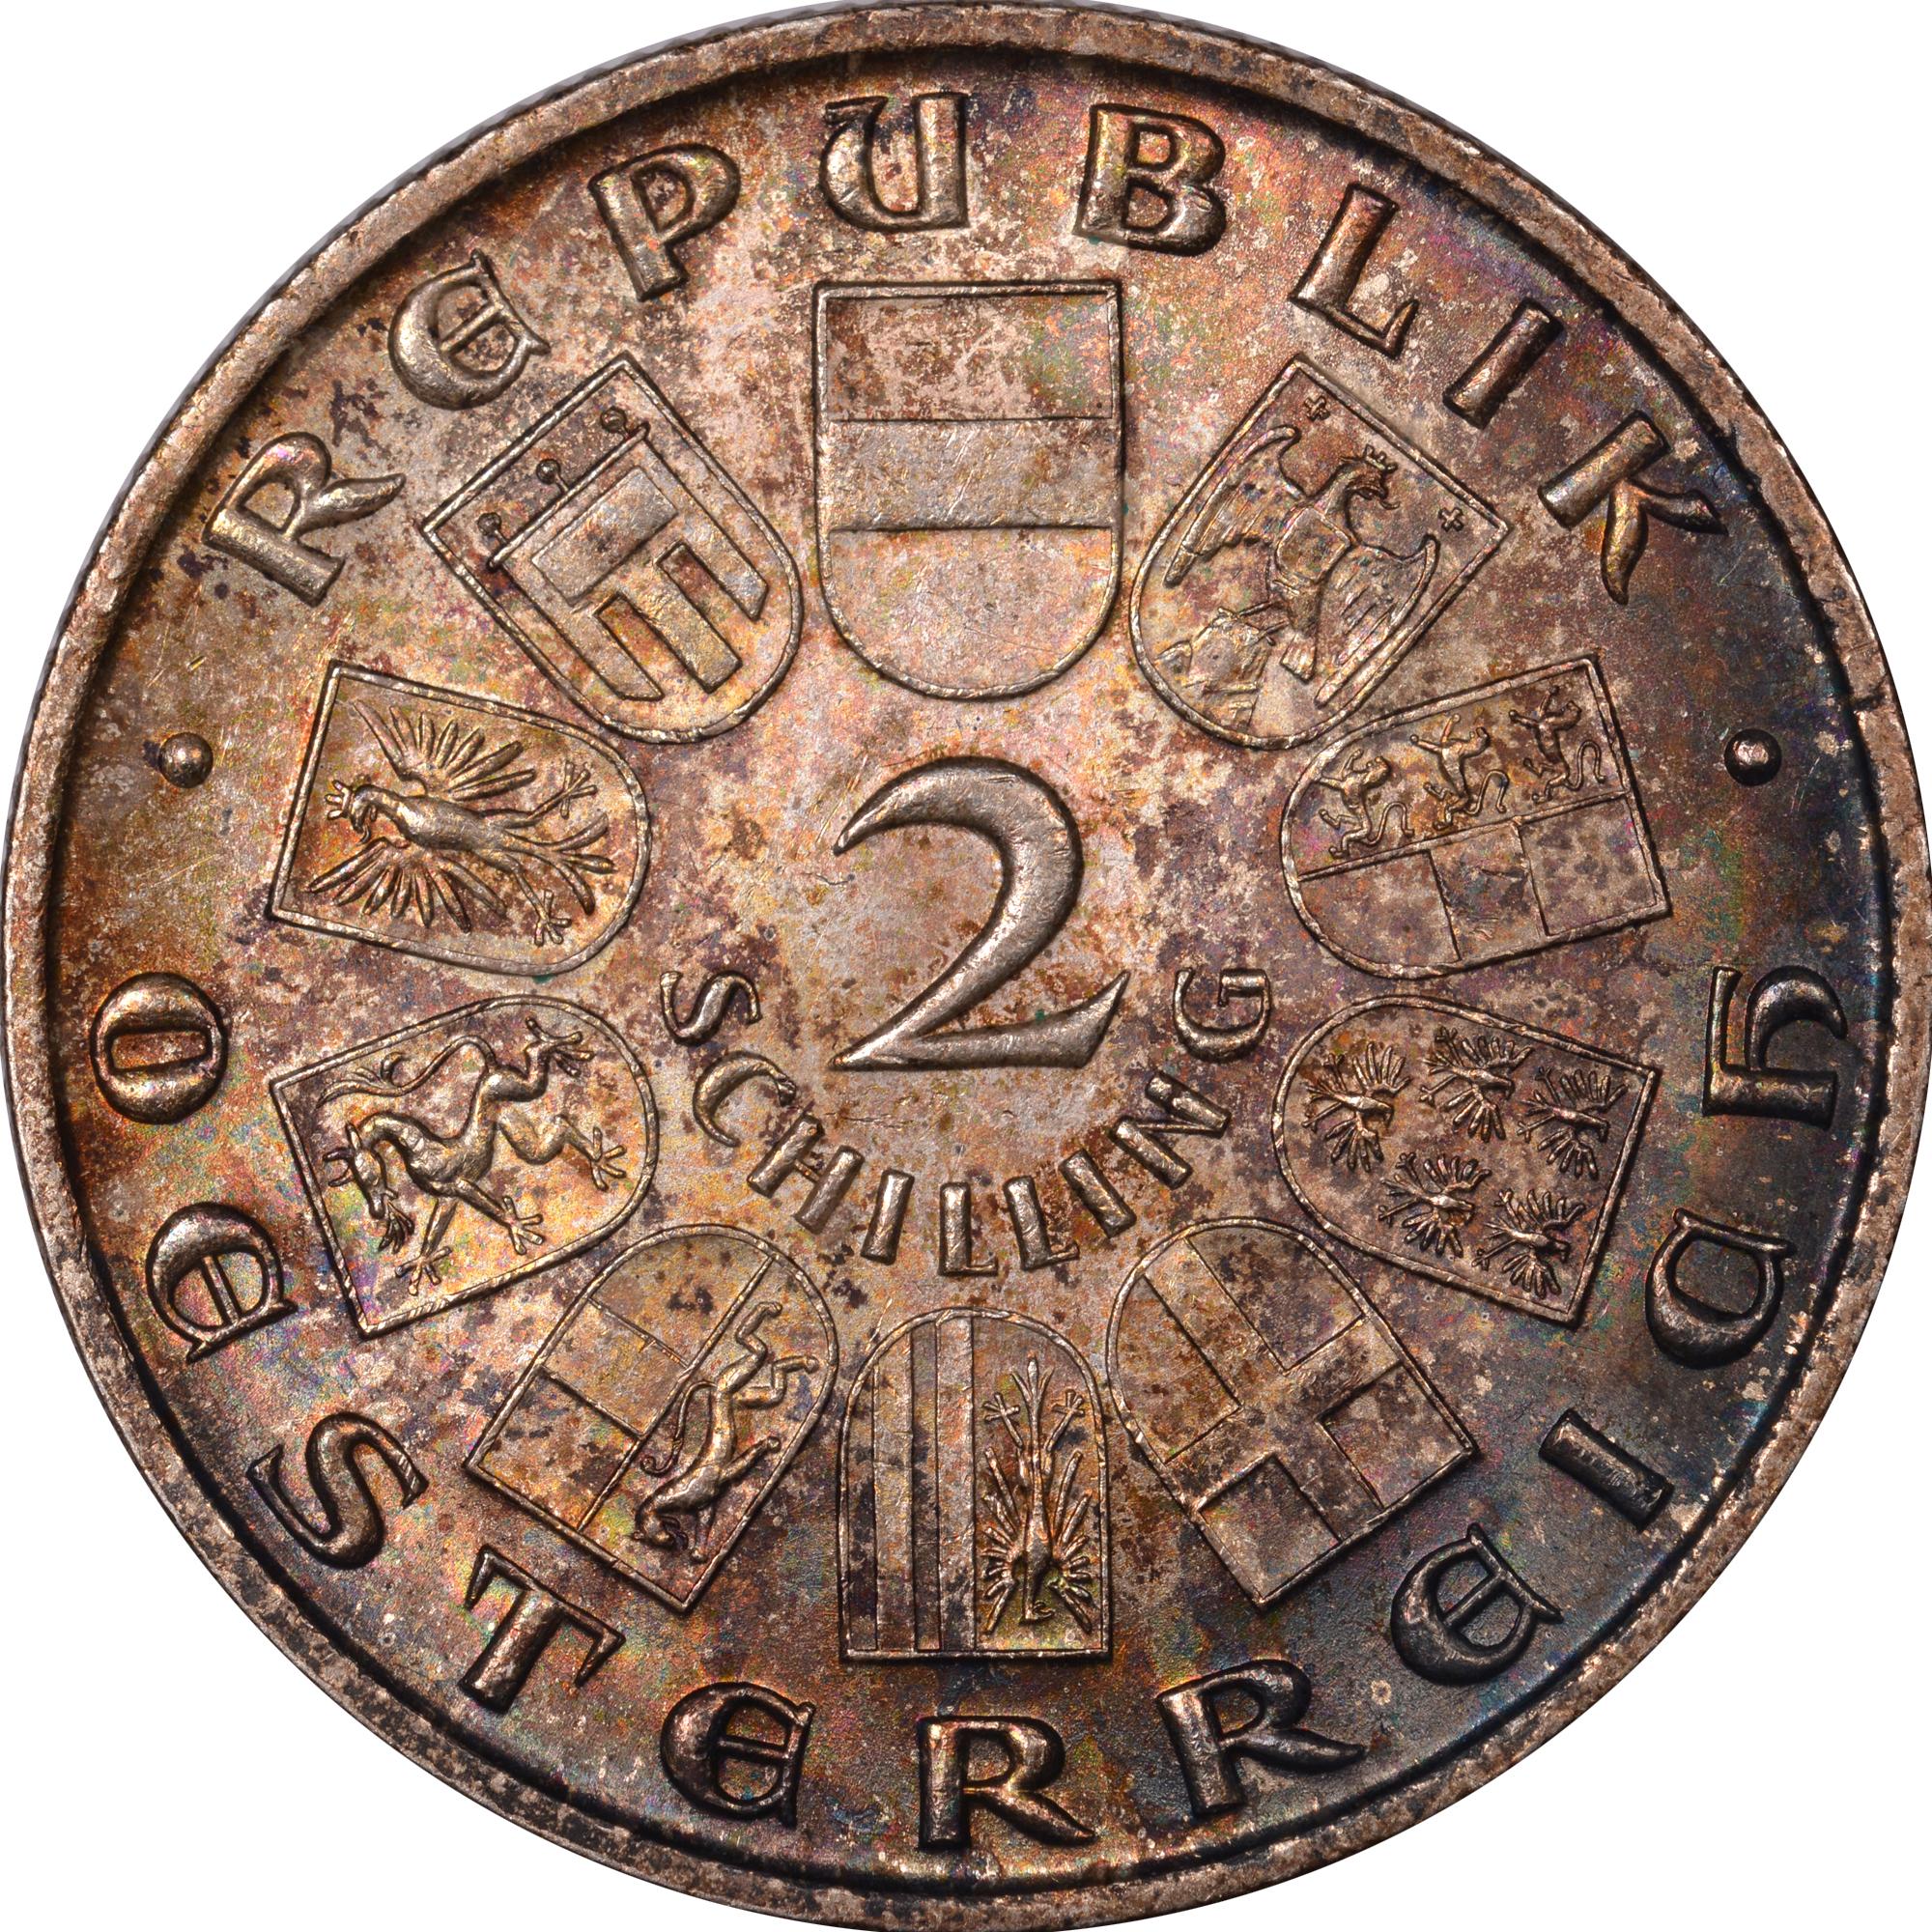 1928 Austria 2 Schilling reverse